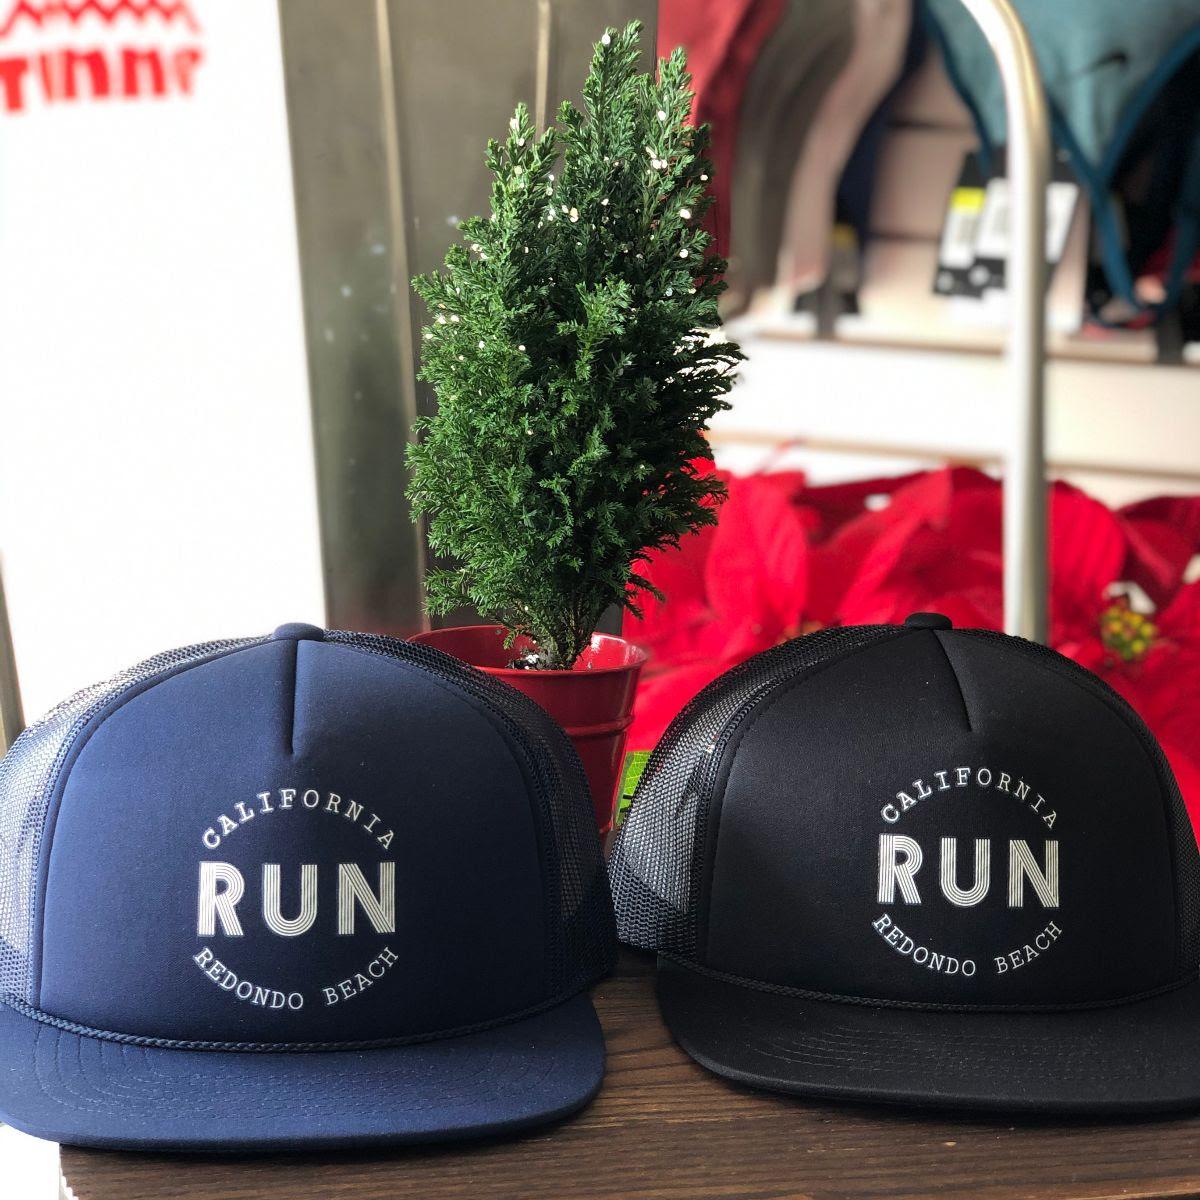 Run Redondo Hats